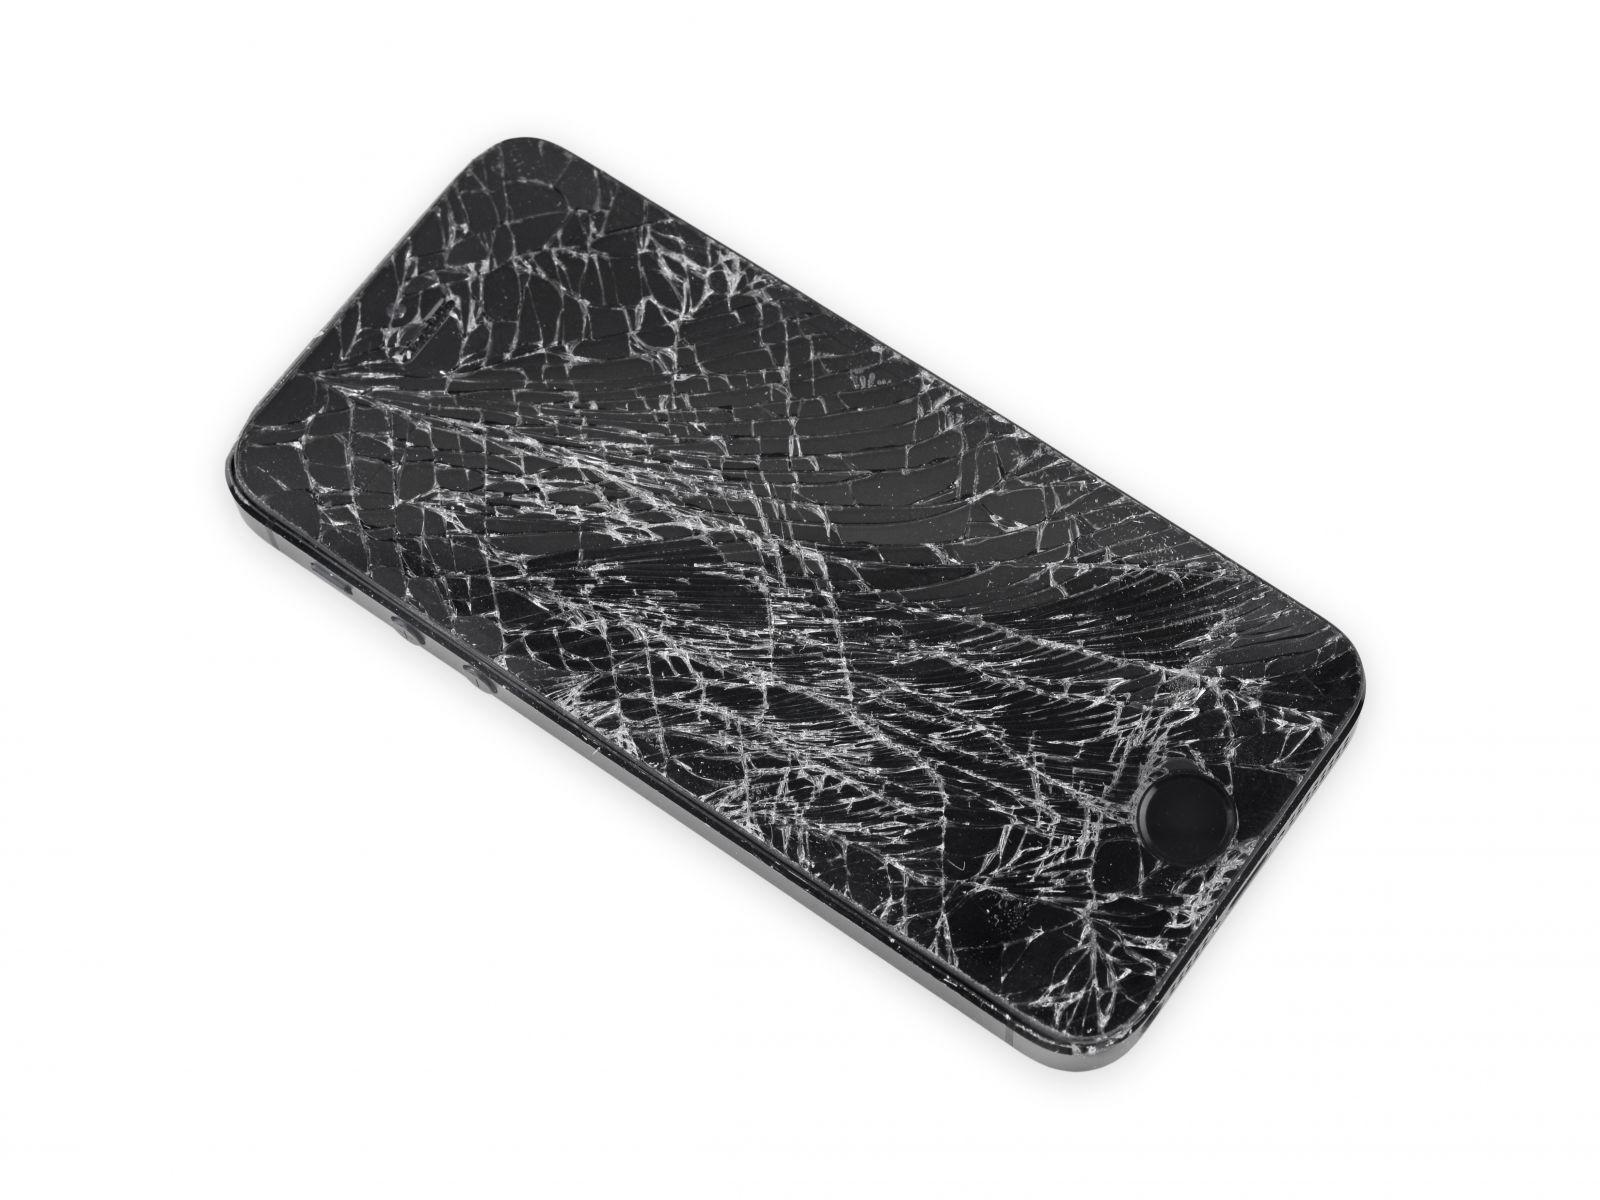 Замена сенсорного стекла и дисплея на iPhone 5S (2)